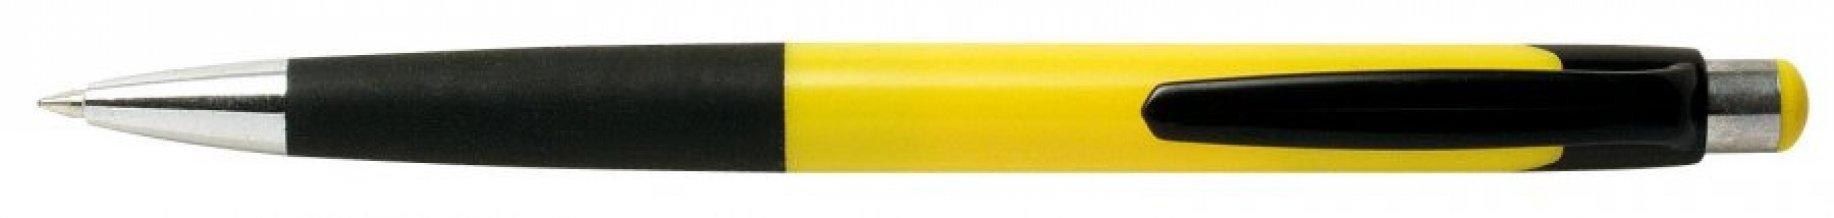 Propiska plast GARNA, žlutá